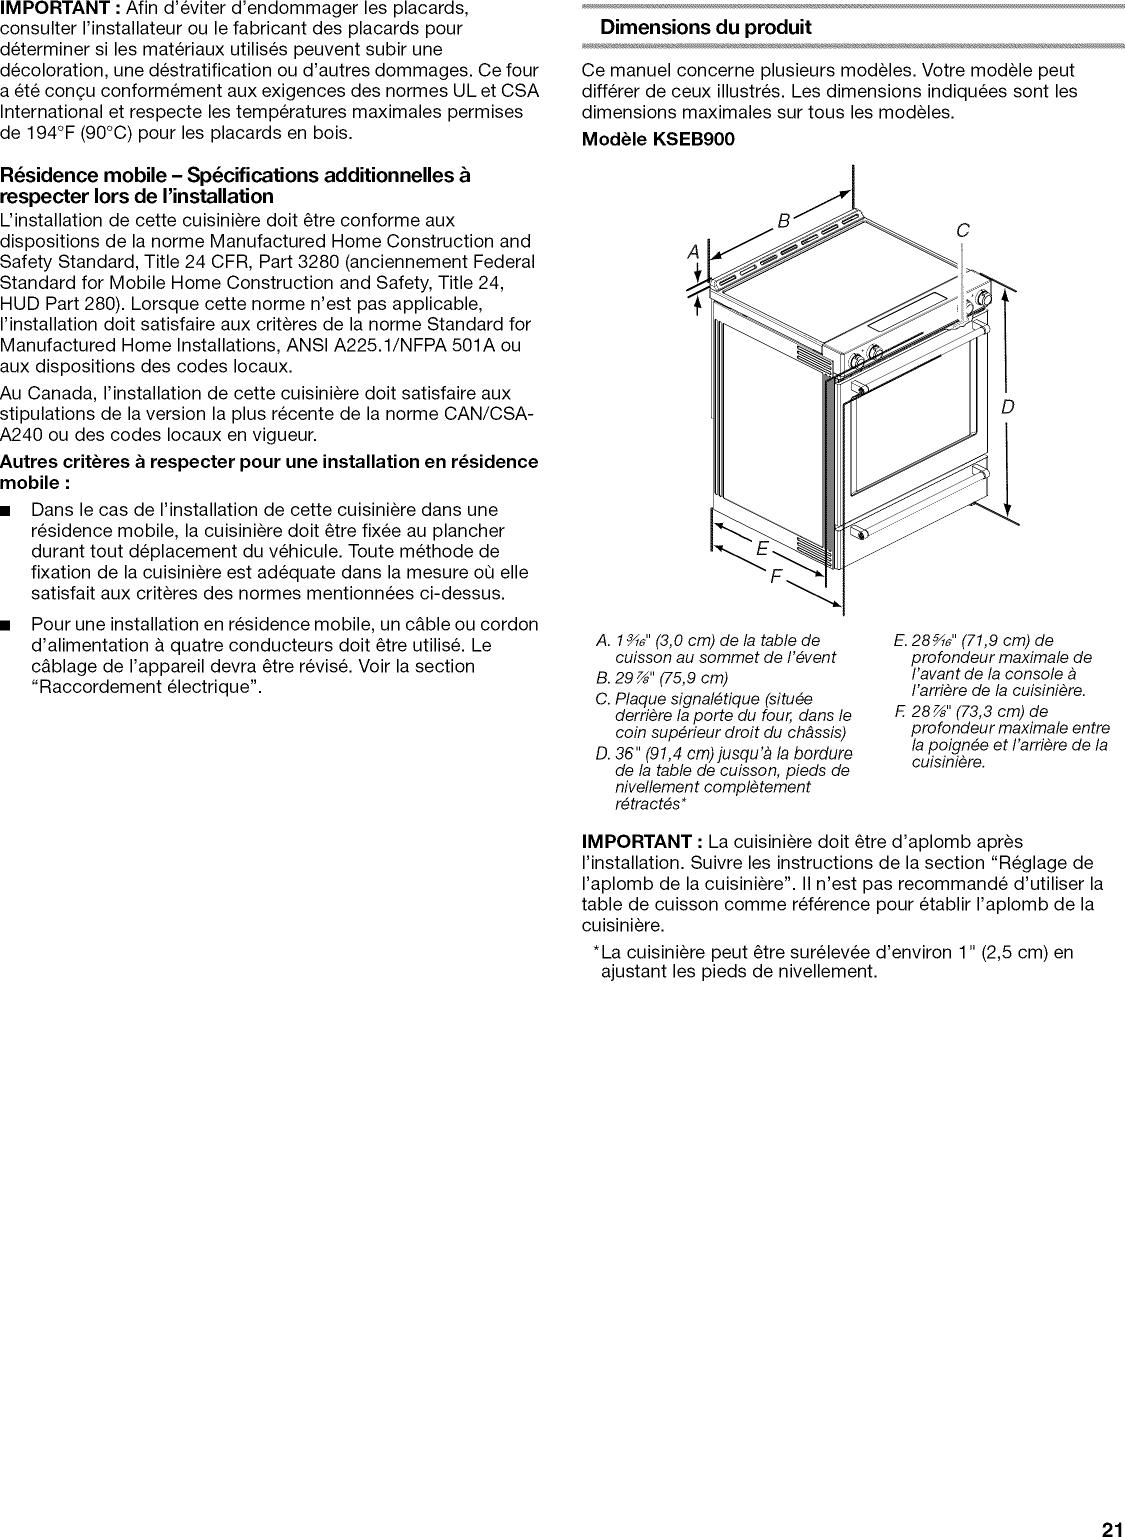 Meuble Sous Plaque Four Ikea ikea iel730cs0 user manual electric in range manuals and